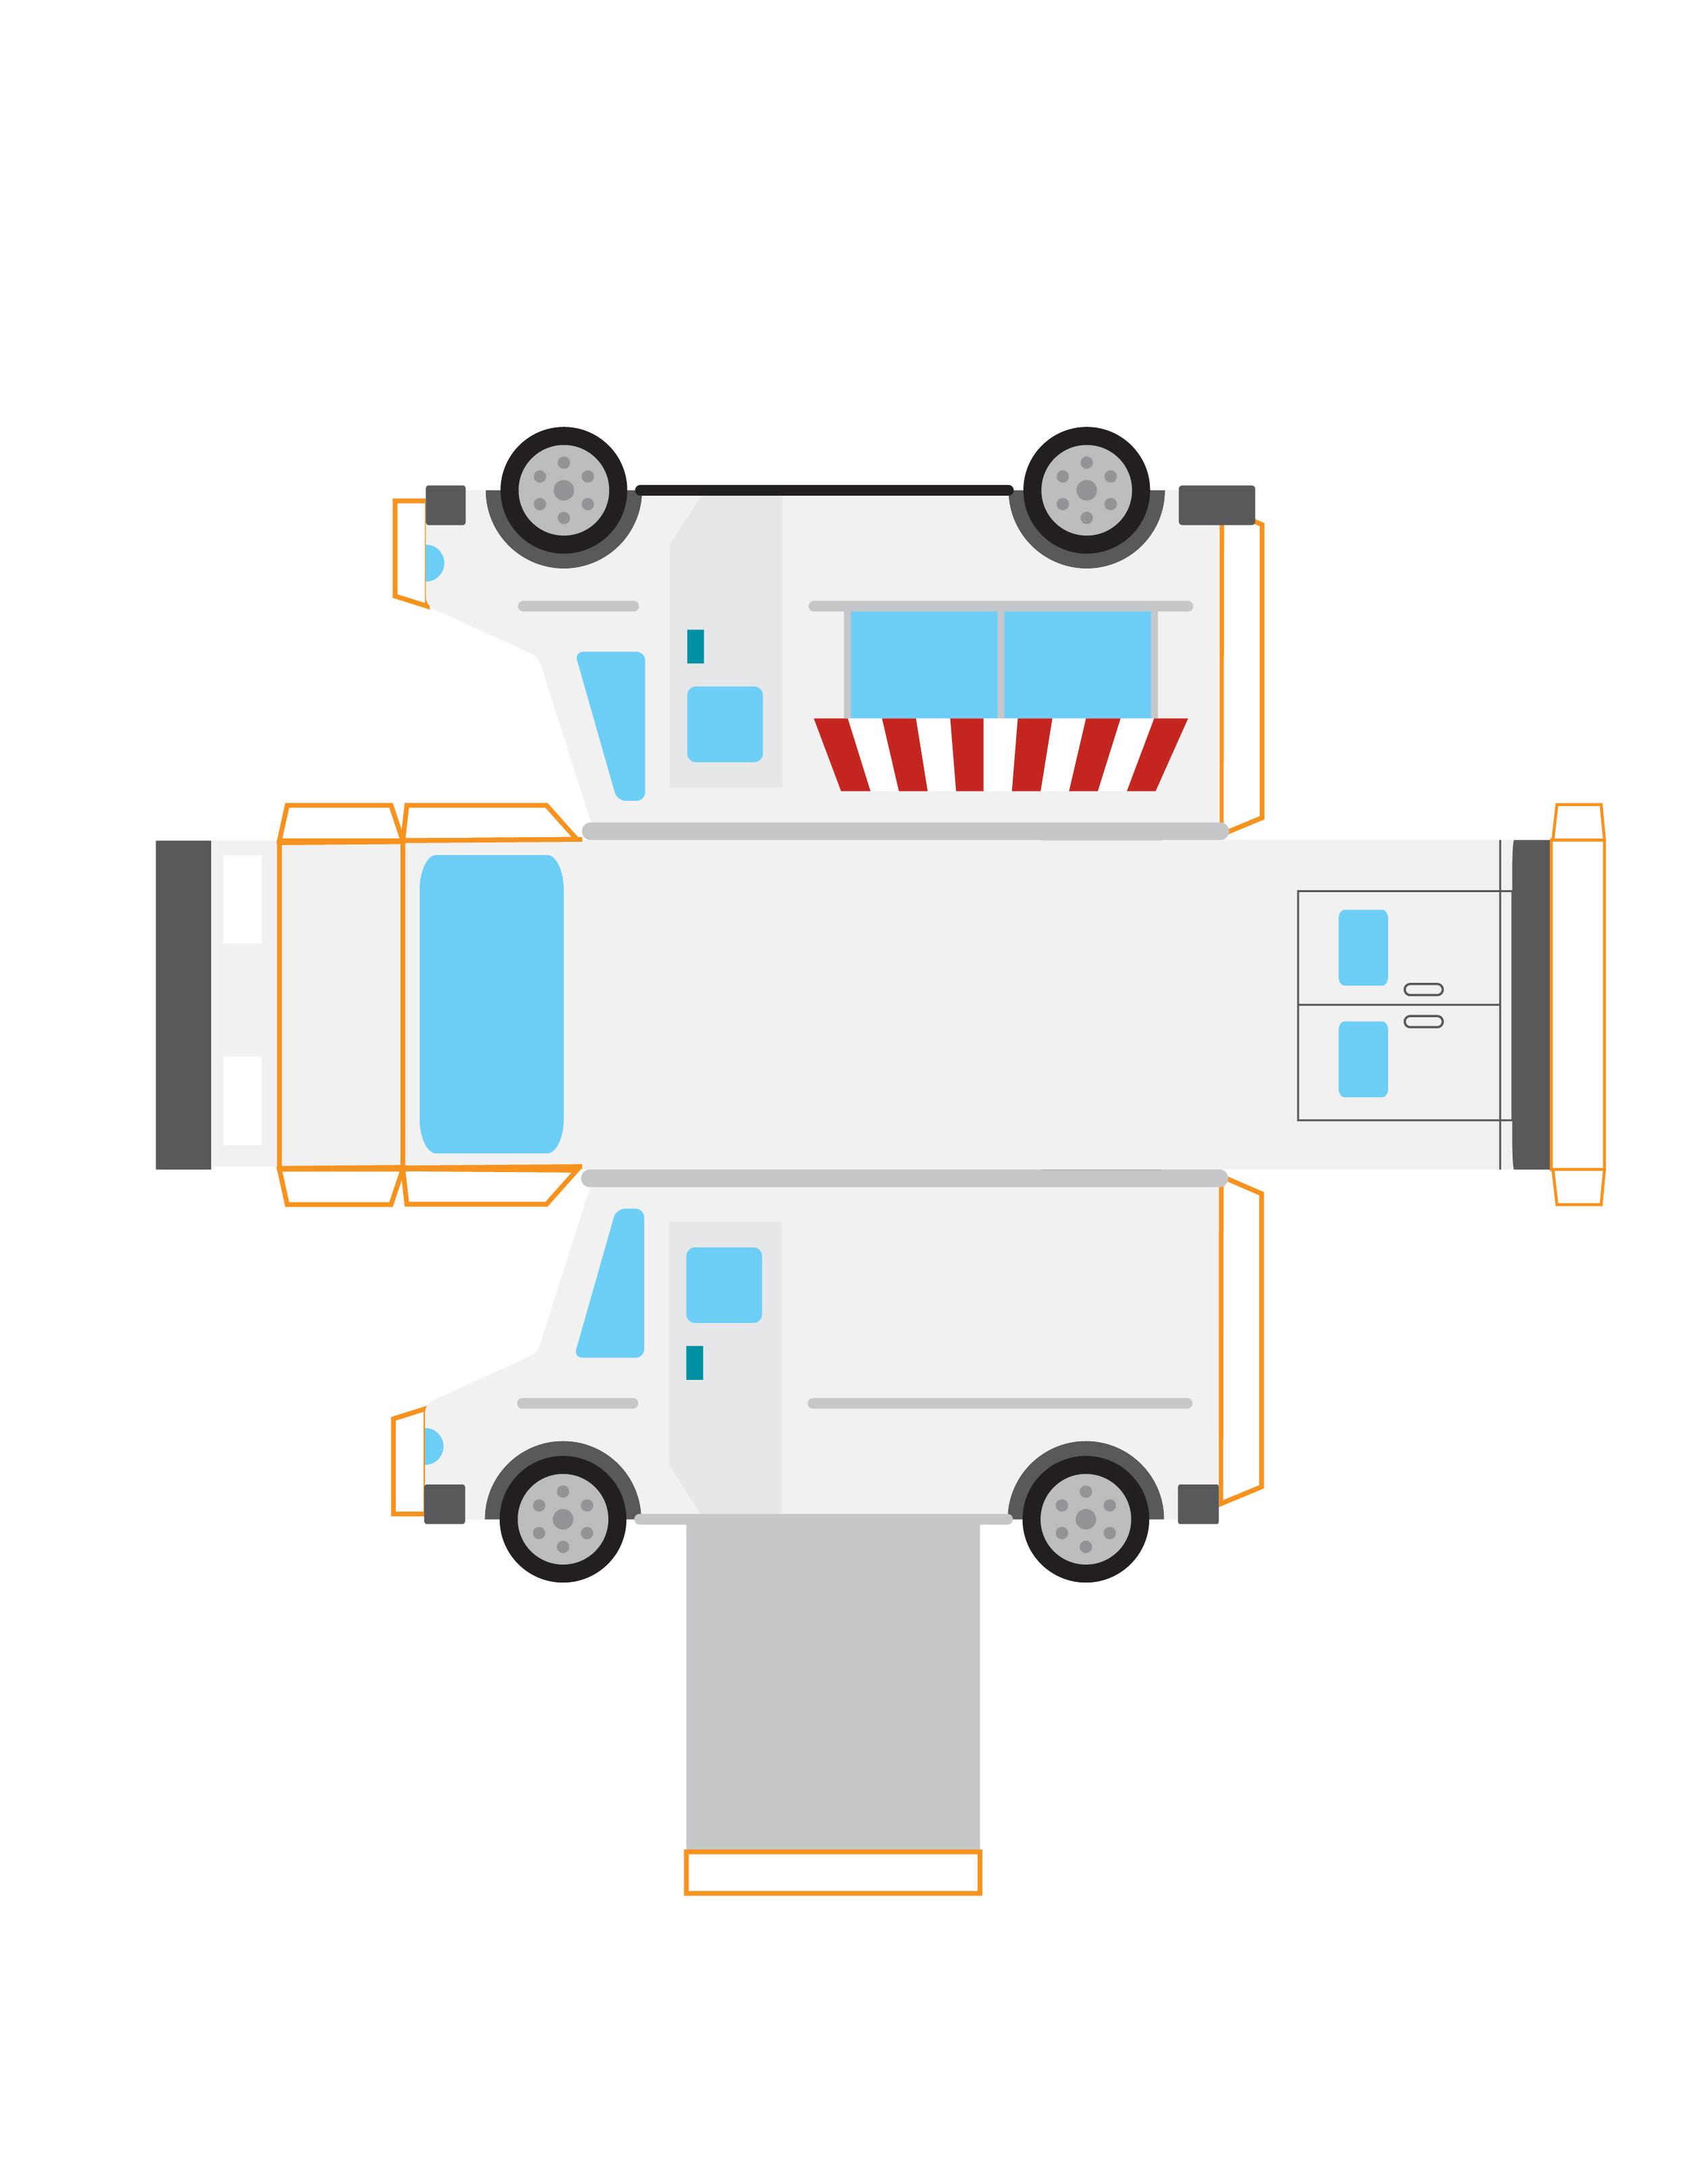 Food Truck Print Outs-01.jpg